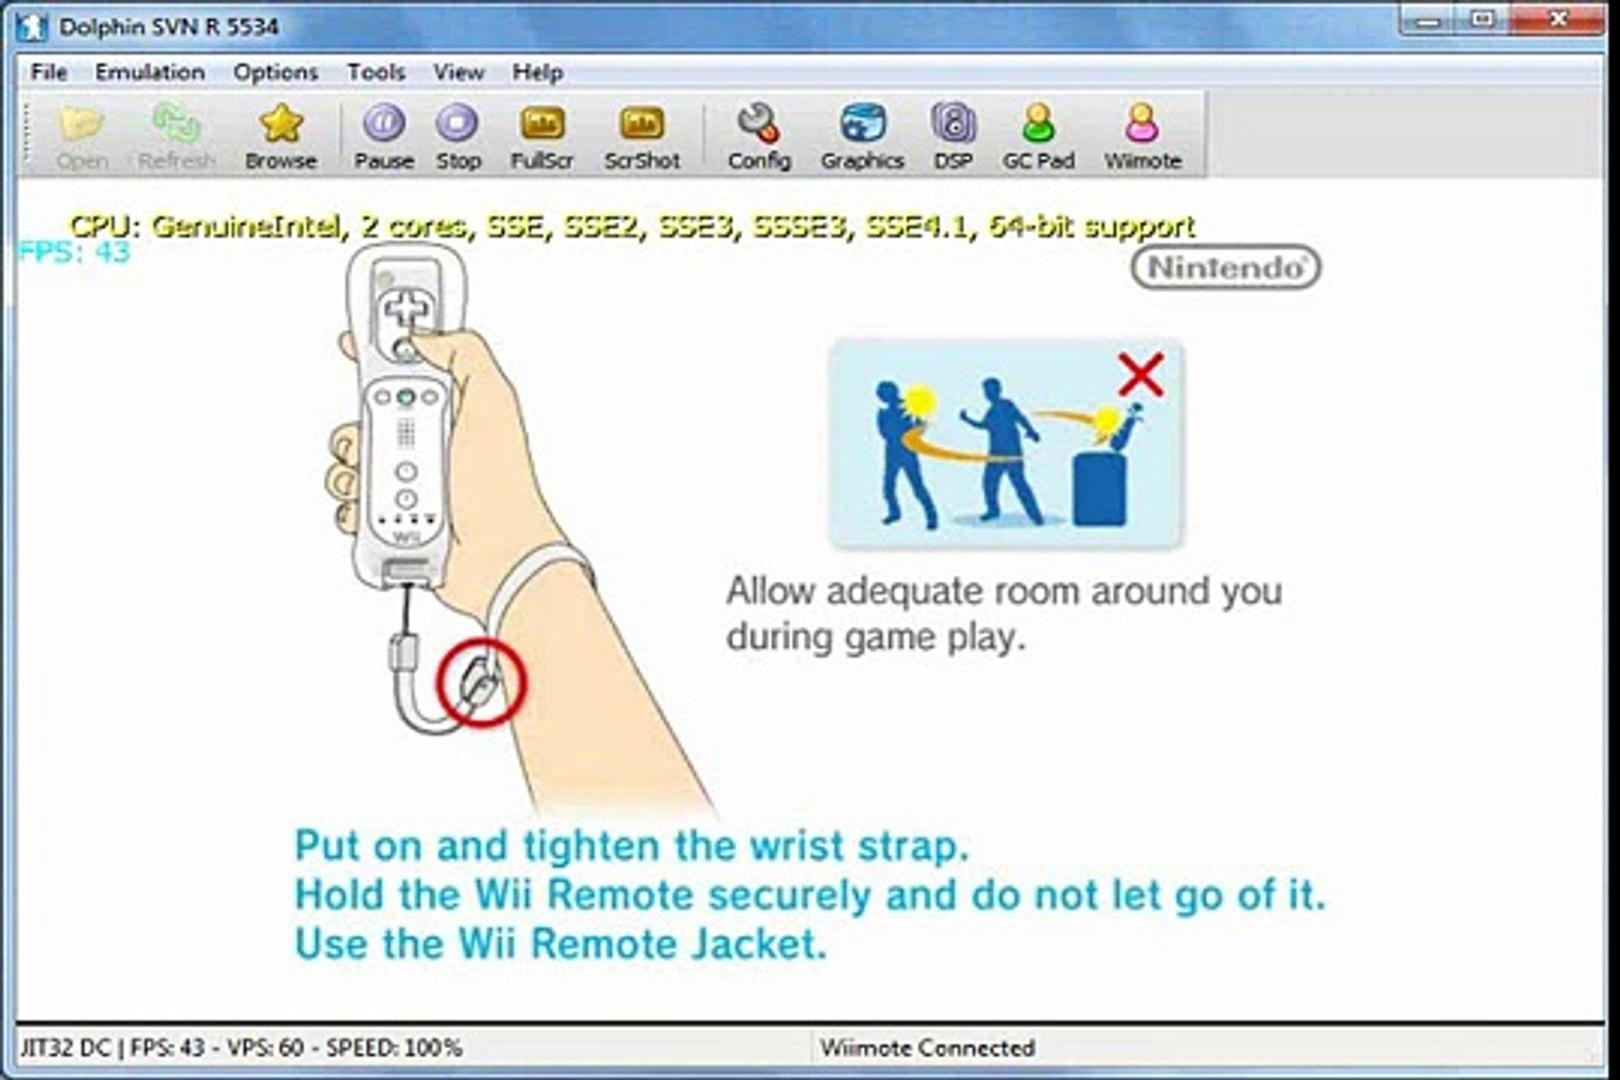 Games Island on Dolphin v2 0 - Nintendo Wii Emulator